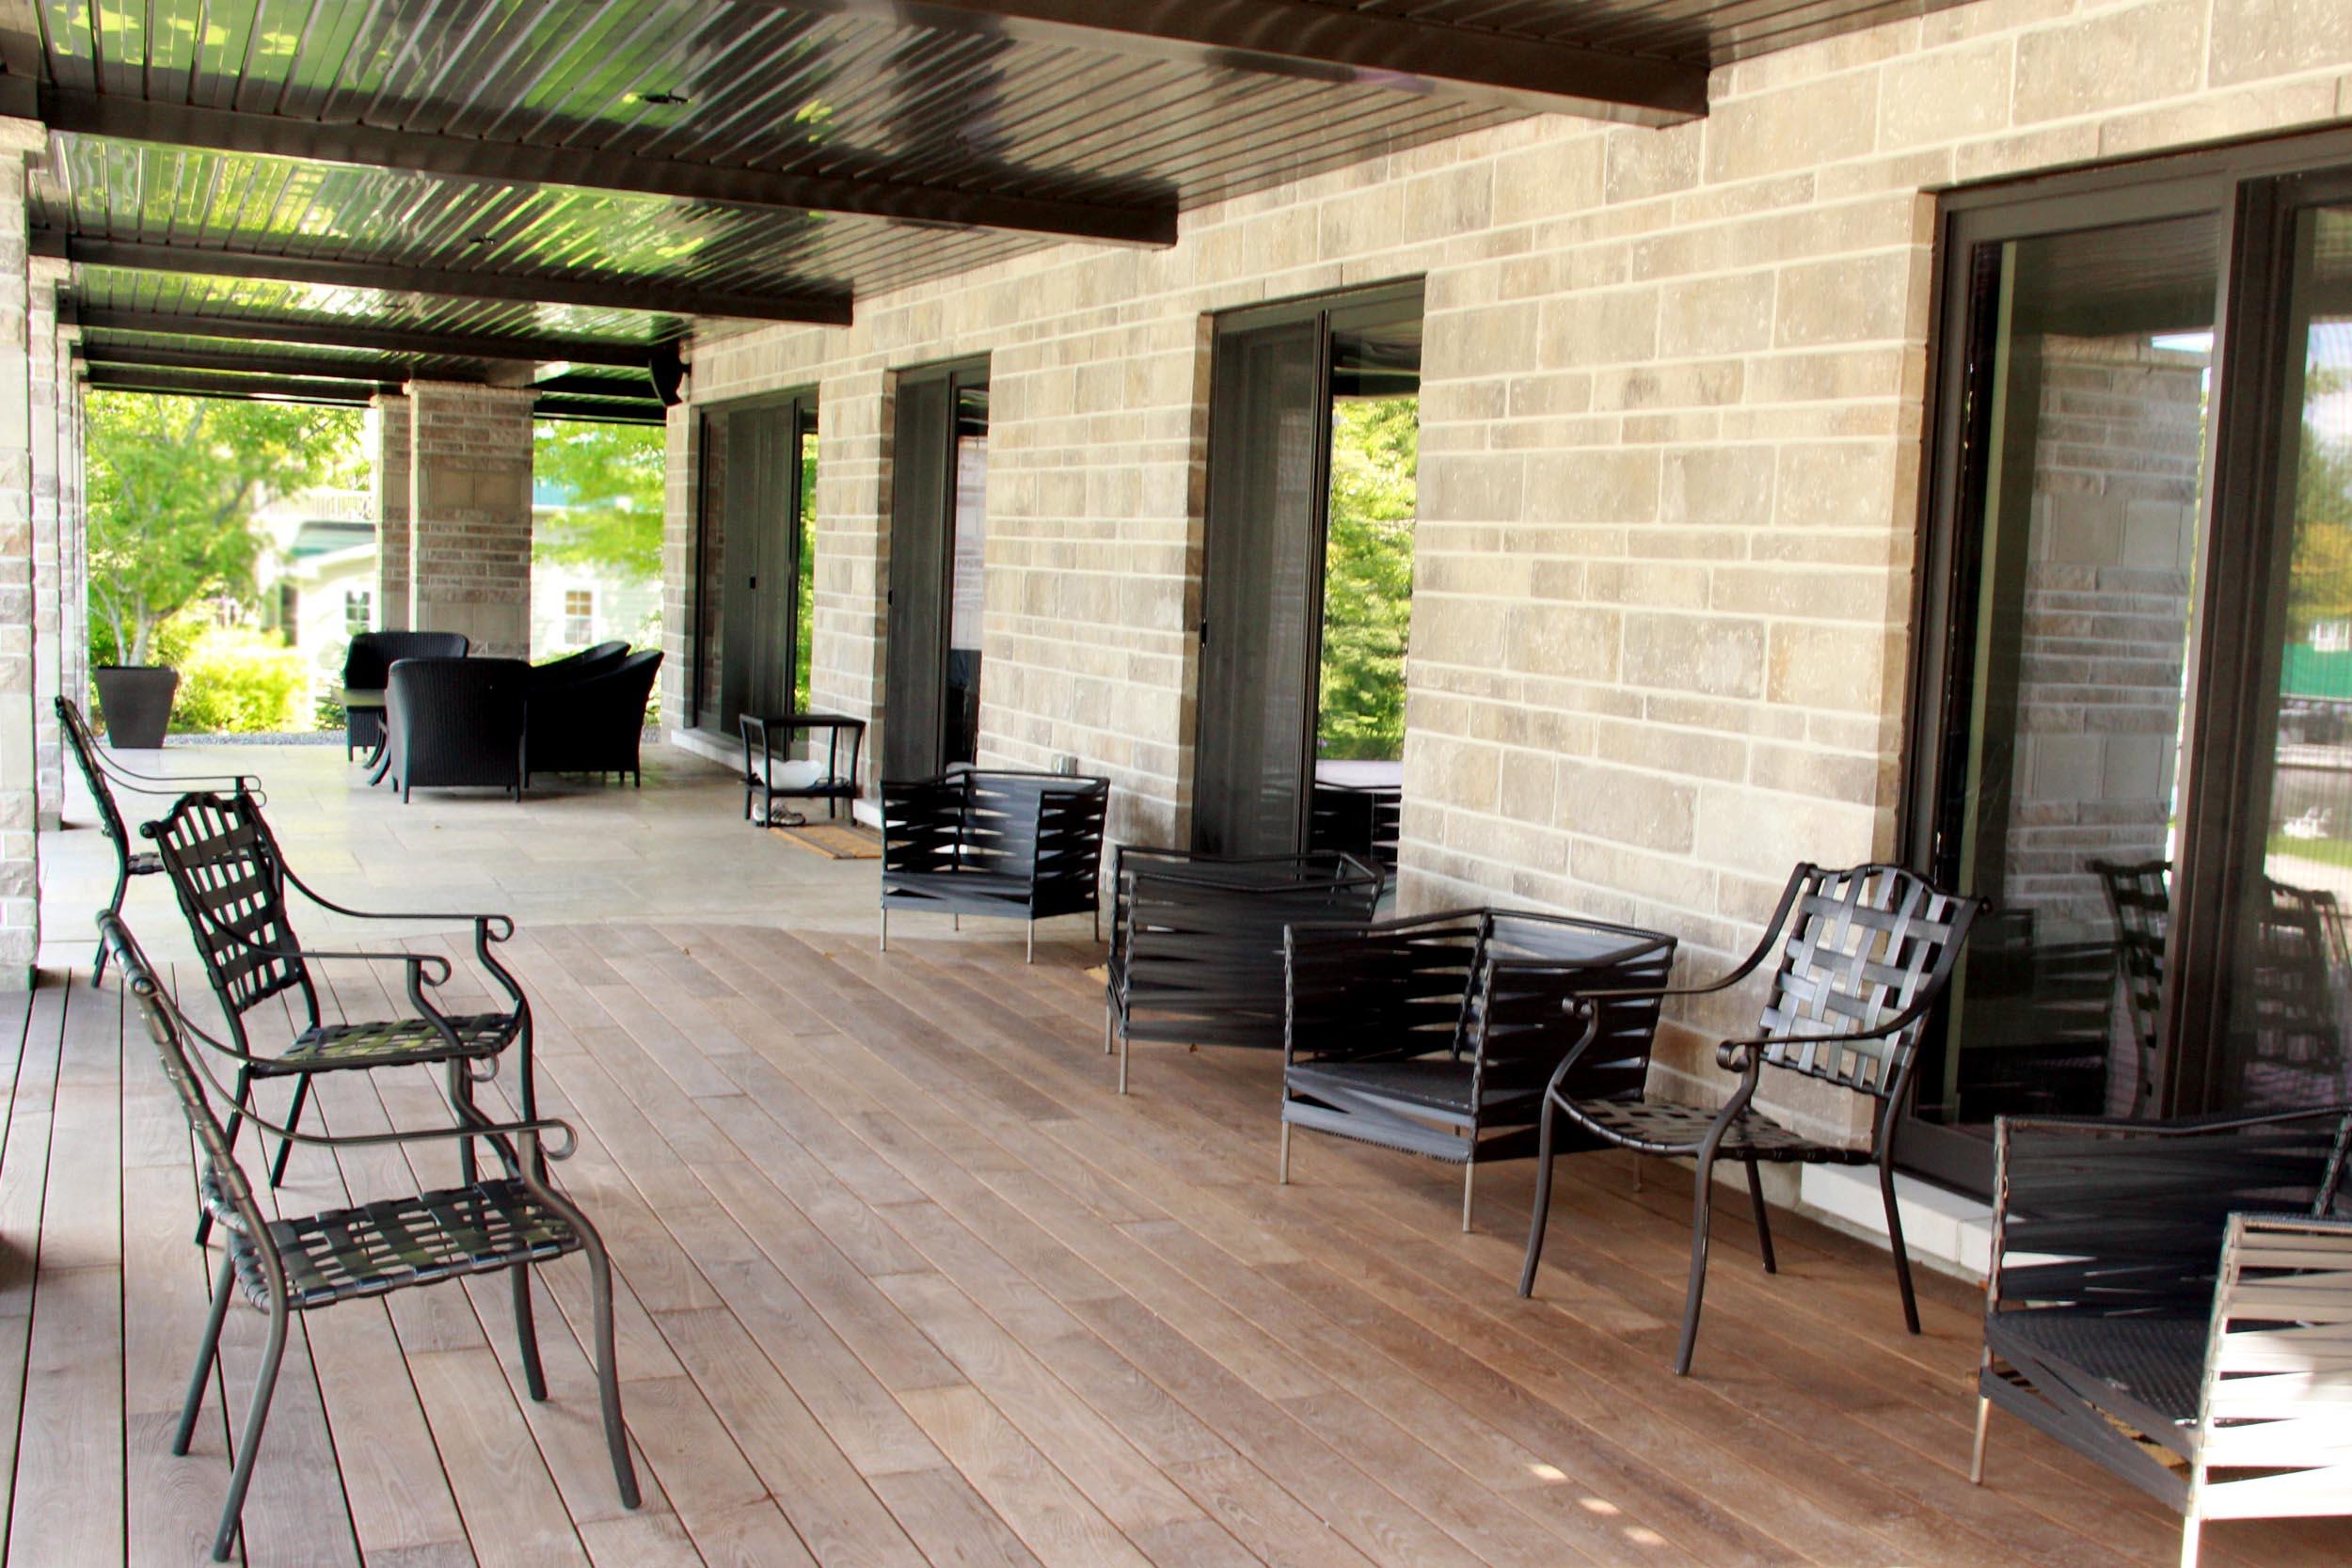 Riverview Design Solutions - Thousand Islands Waterfront - Landscape Architecture - Below deck.jpg